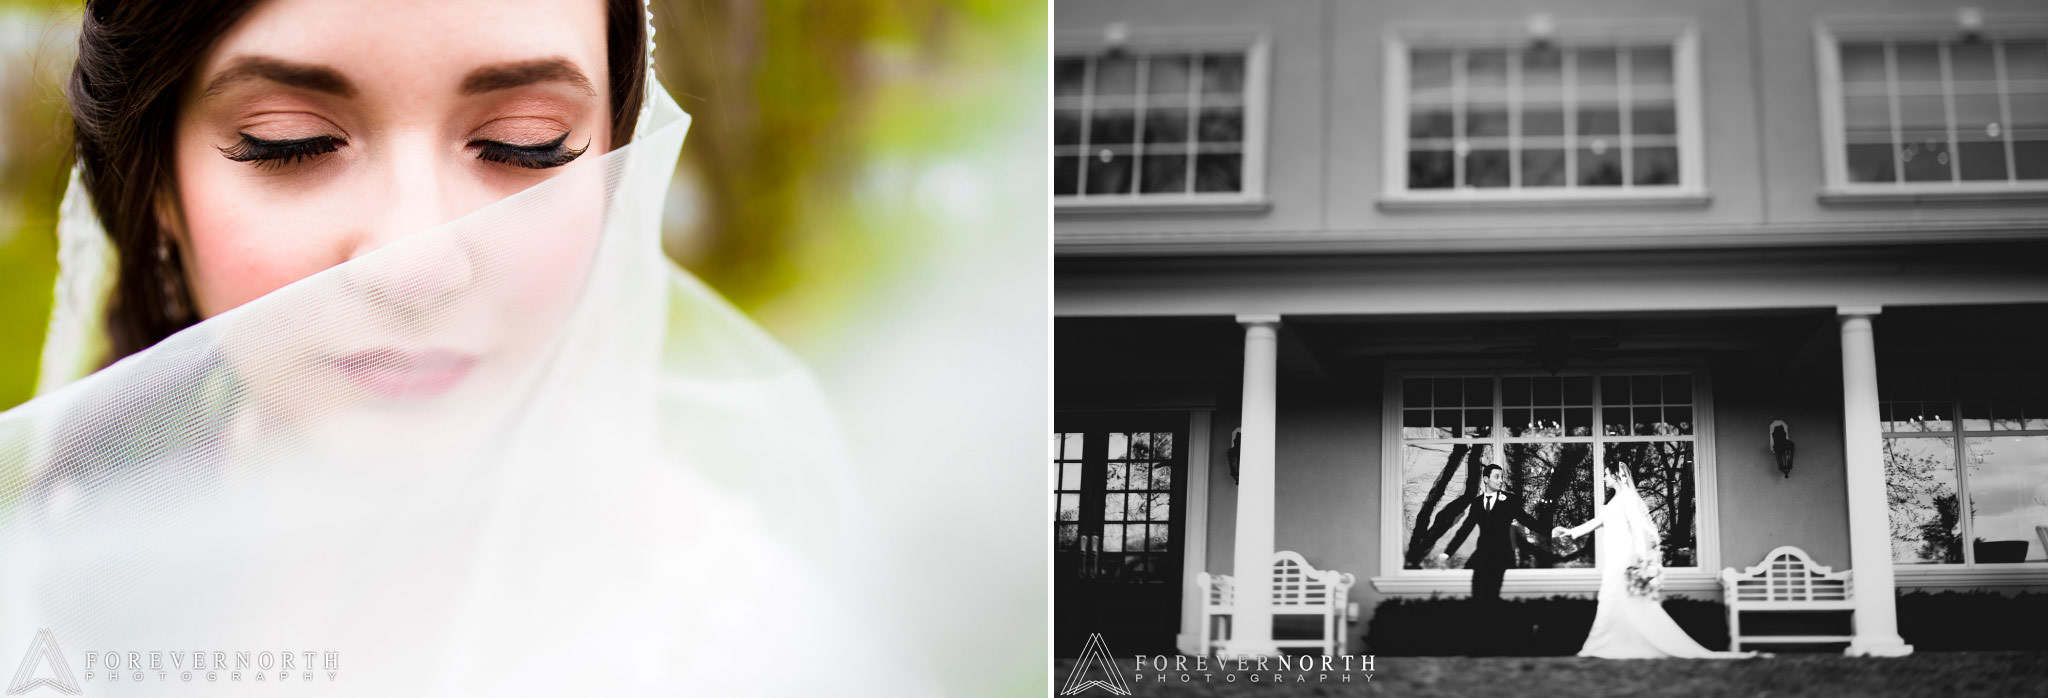 Rivera-Bradford-Estate-Wedding-Photographer-01.JPG